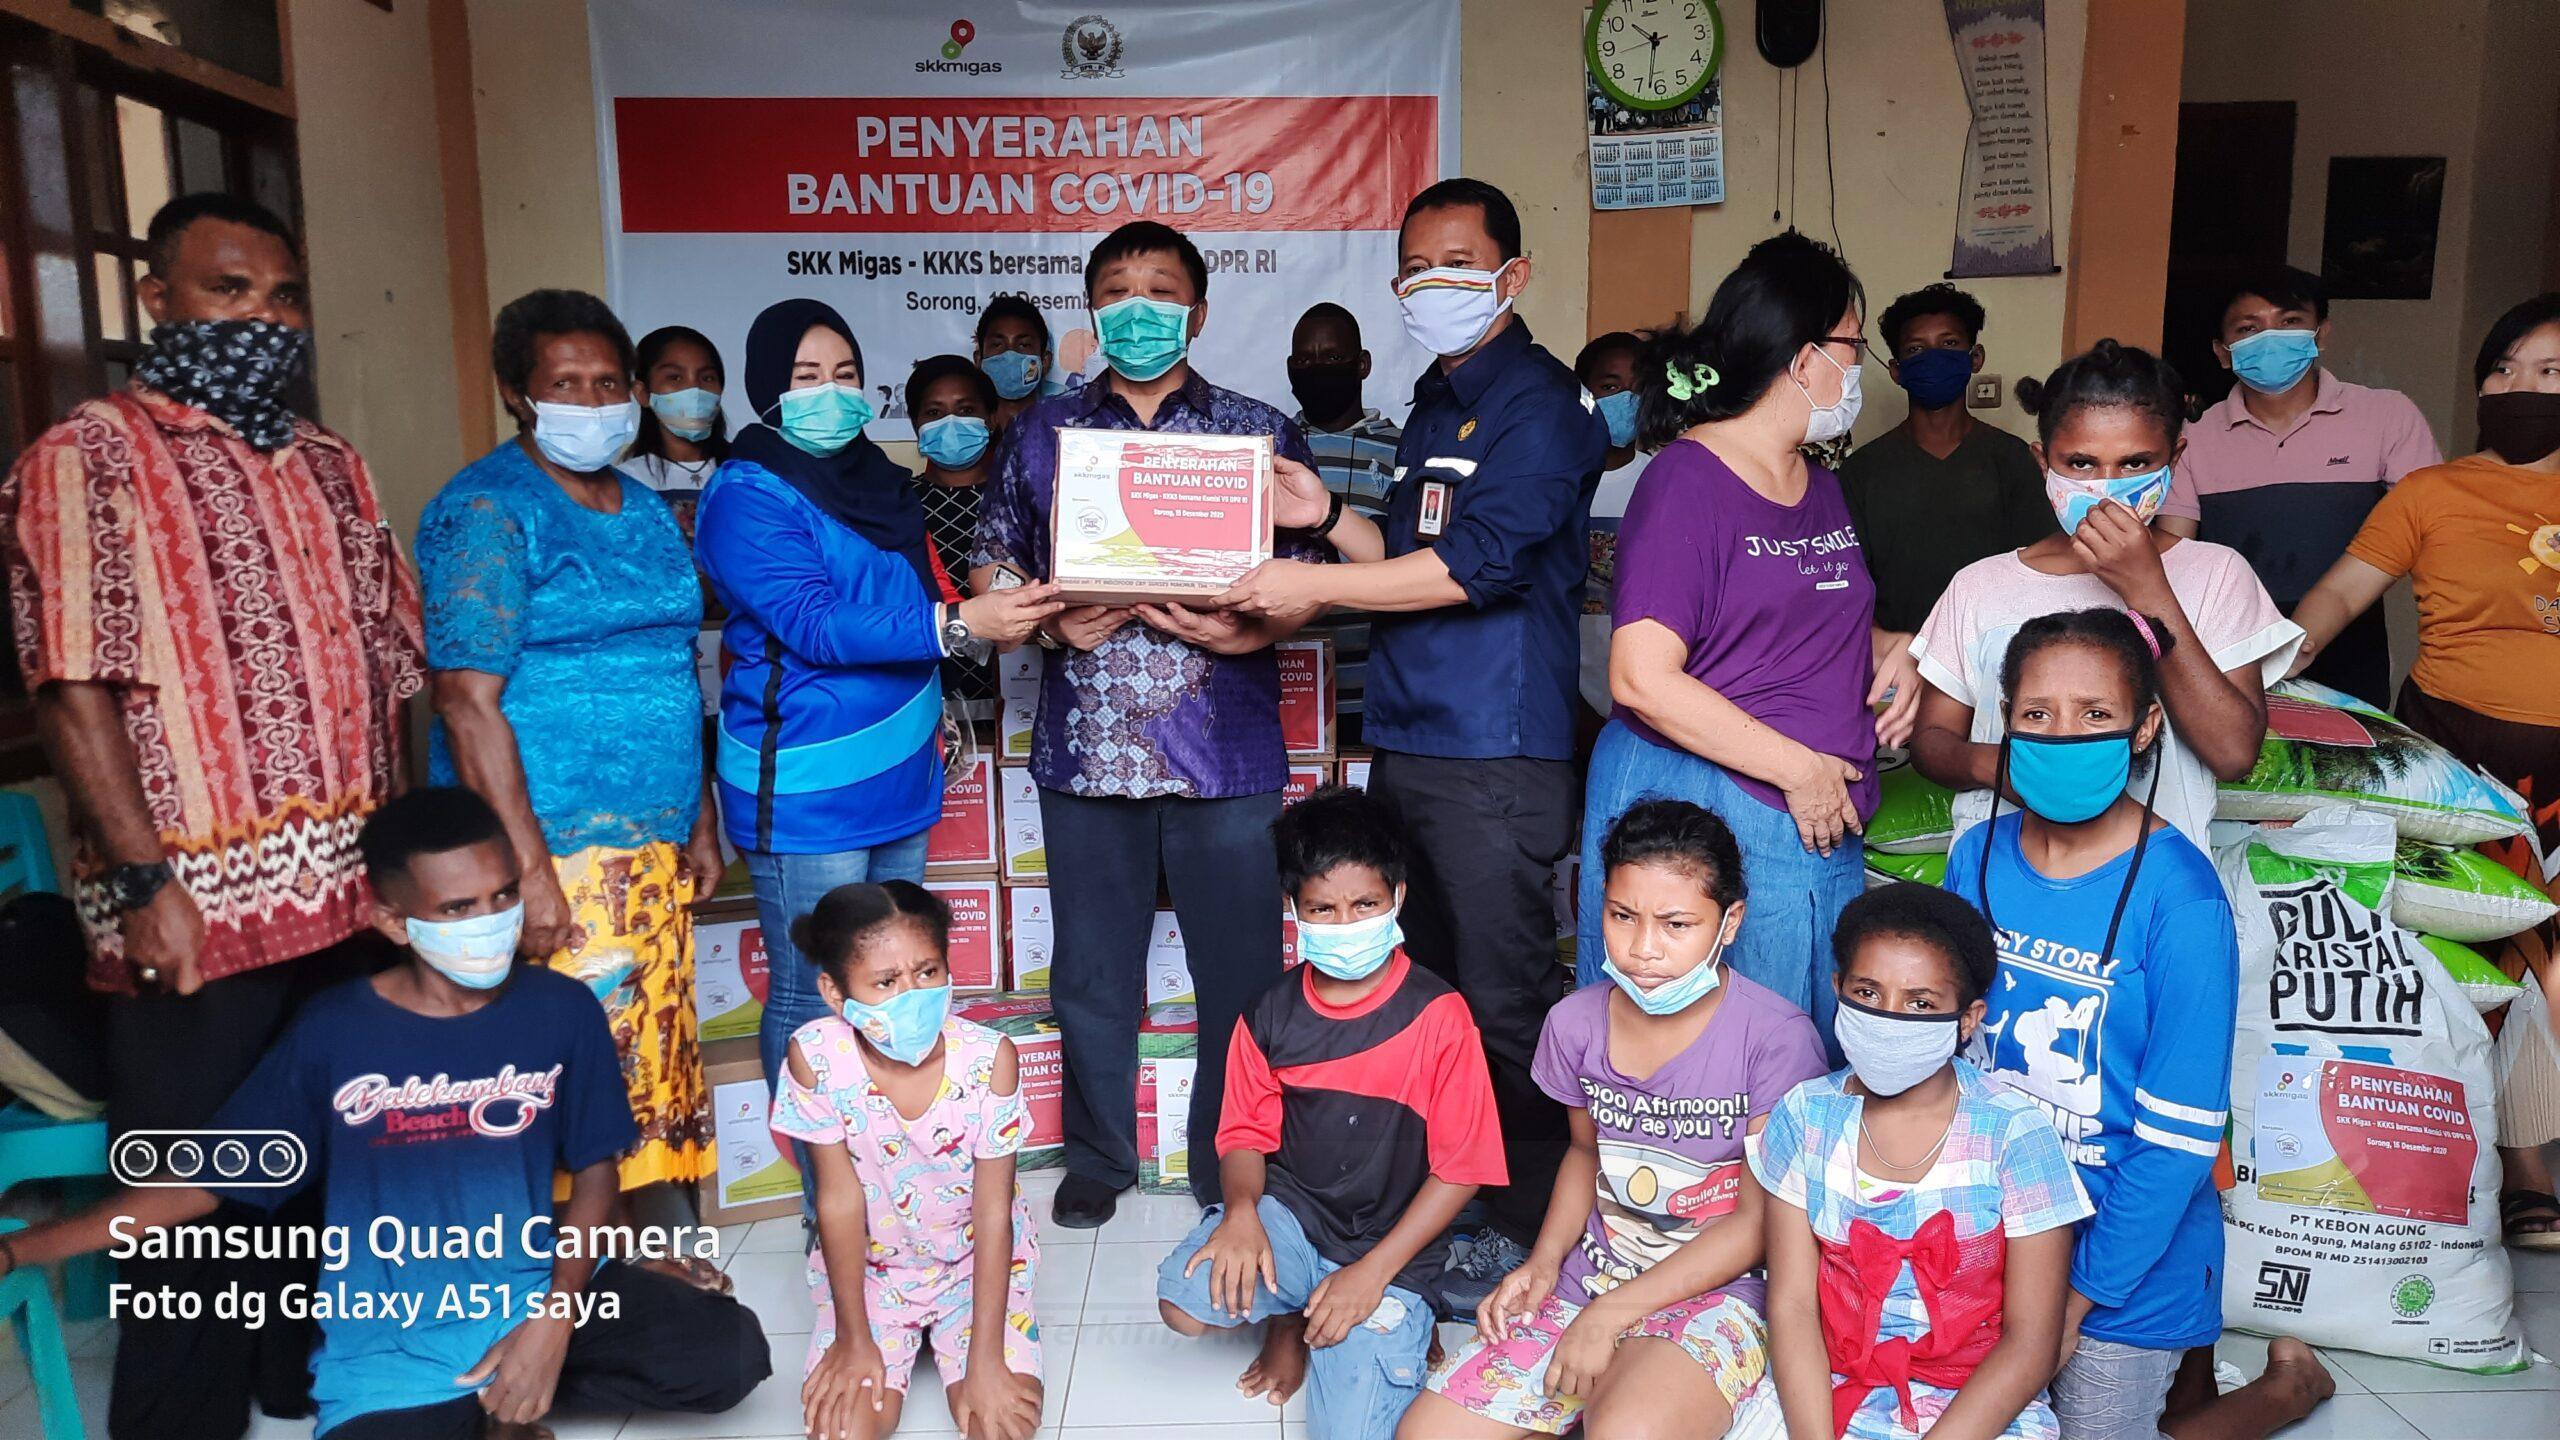 Rico Sia Bersama SKK Migas Serahkan Bantuan Sembako ke 6 Panti Asuhan di Sorong 26 20201216 103124 scaled